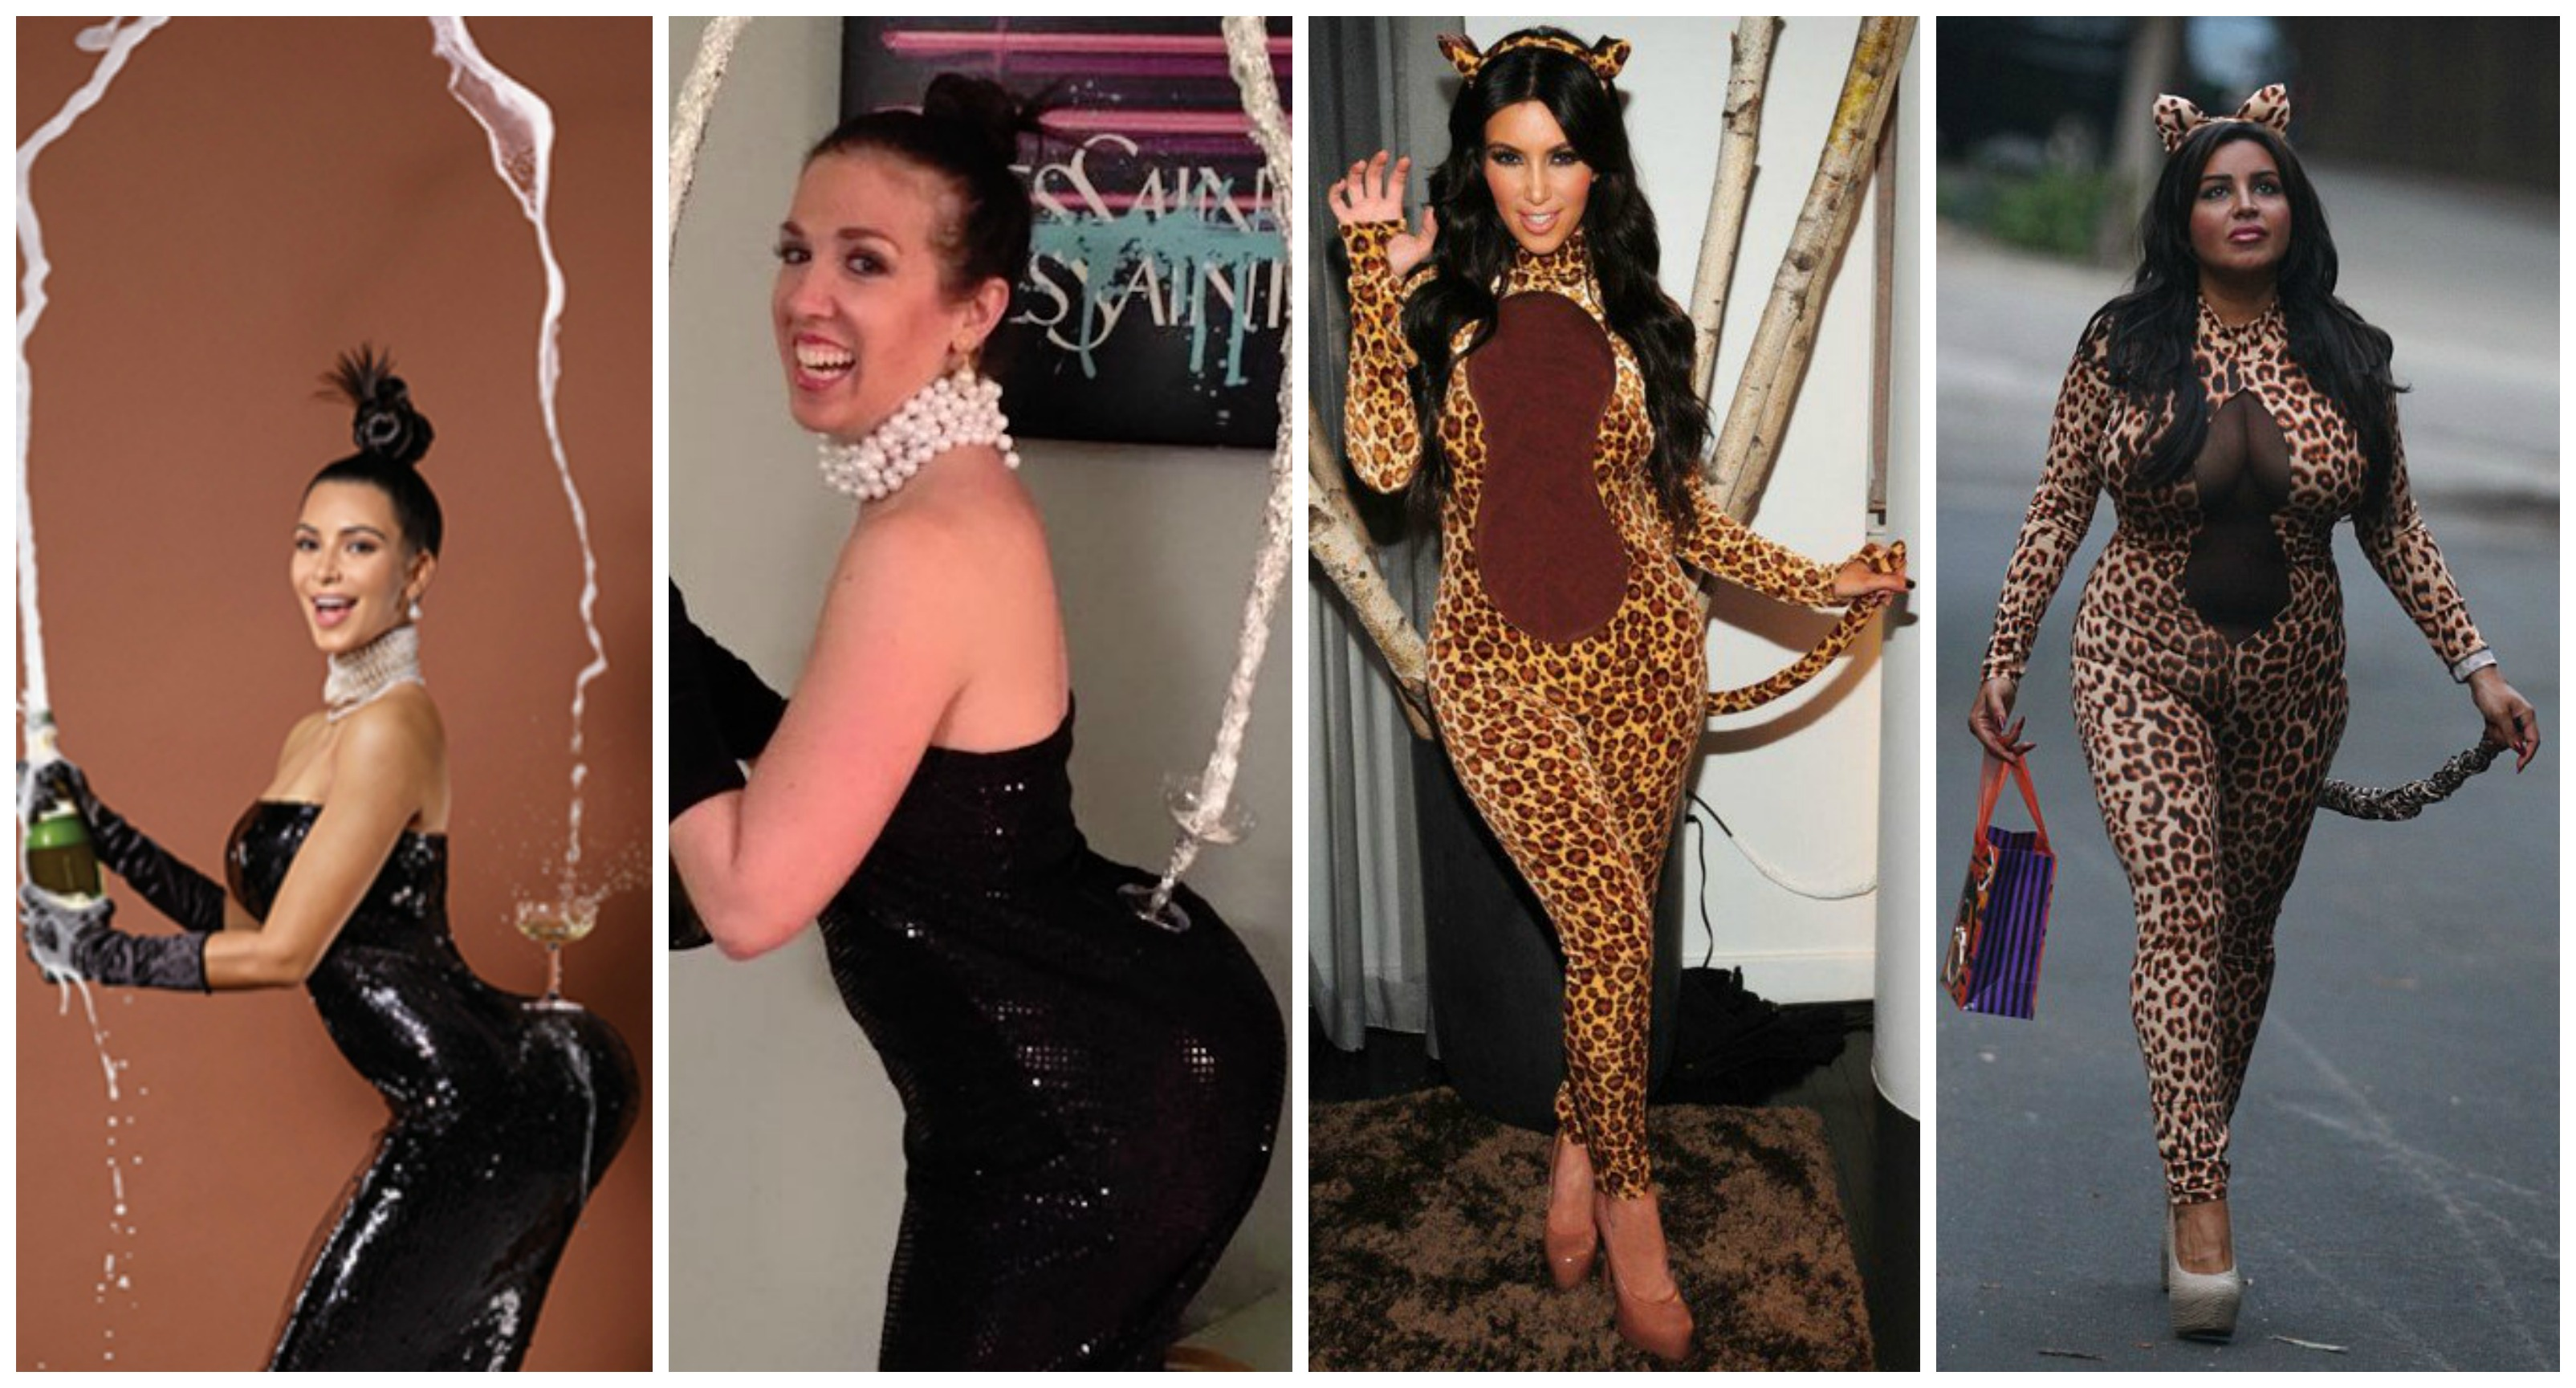 kim-kardashian-in-keeping-up-with-the-kardashians